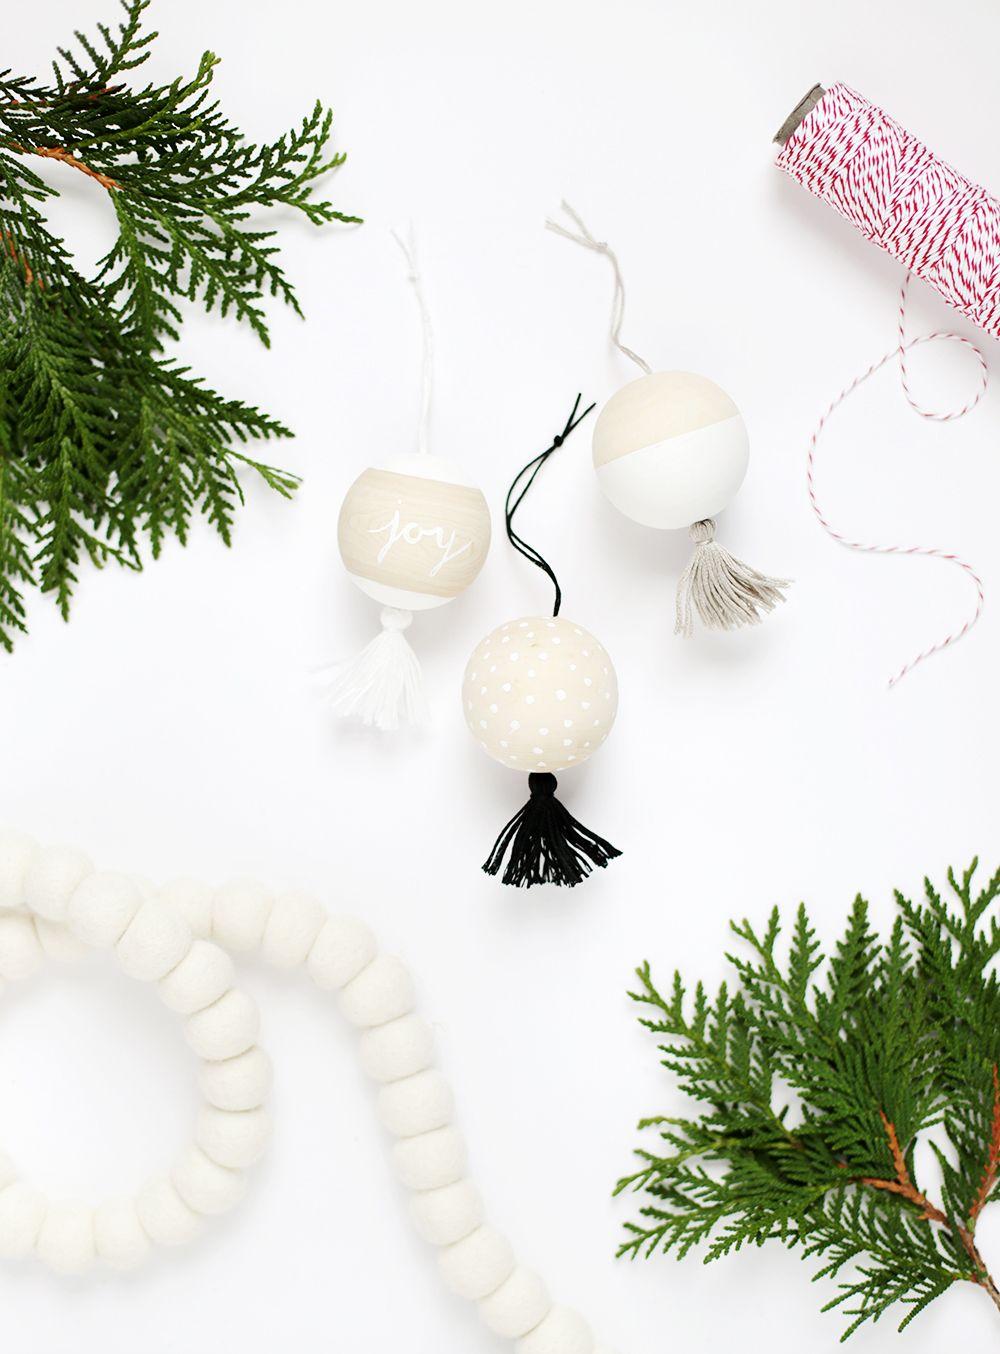 Diy Wooden Tassel Ornaments The Holiday Collective Beaded Ornaments Diy Minimalist Christmas Tassel Ornament